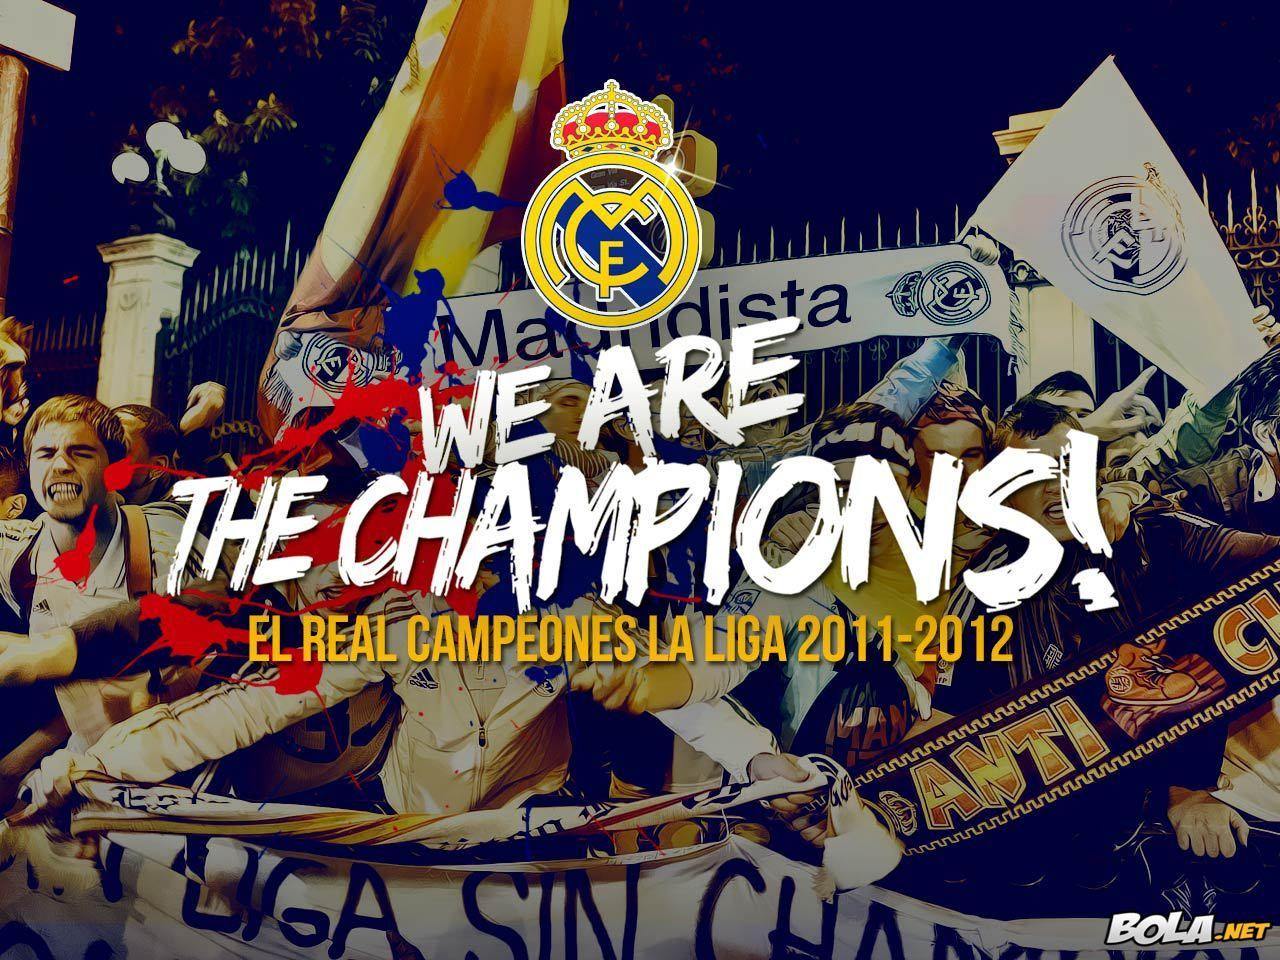 Jersey Syal Glory Pesta Juara Madridista Campeone32